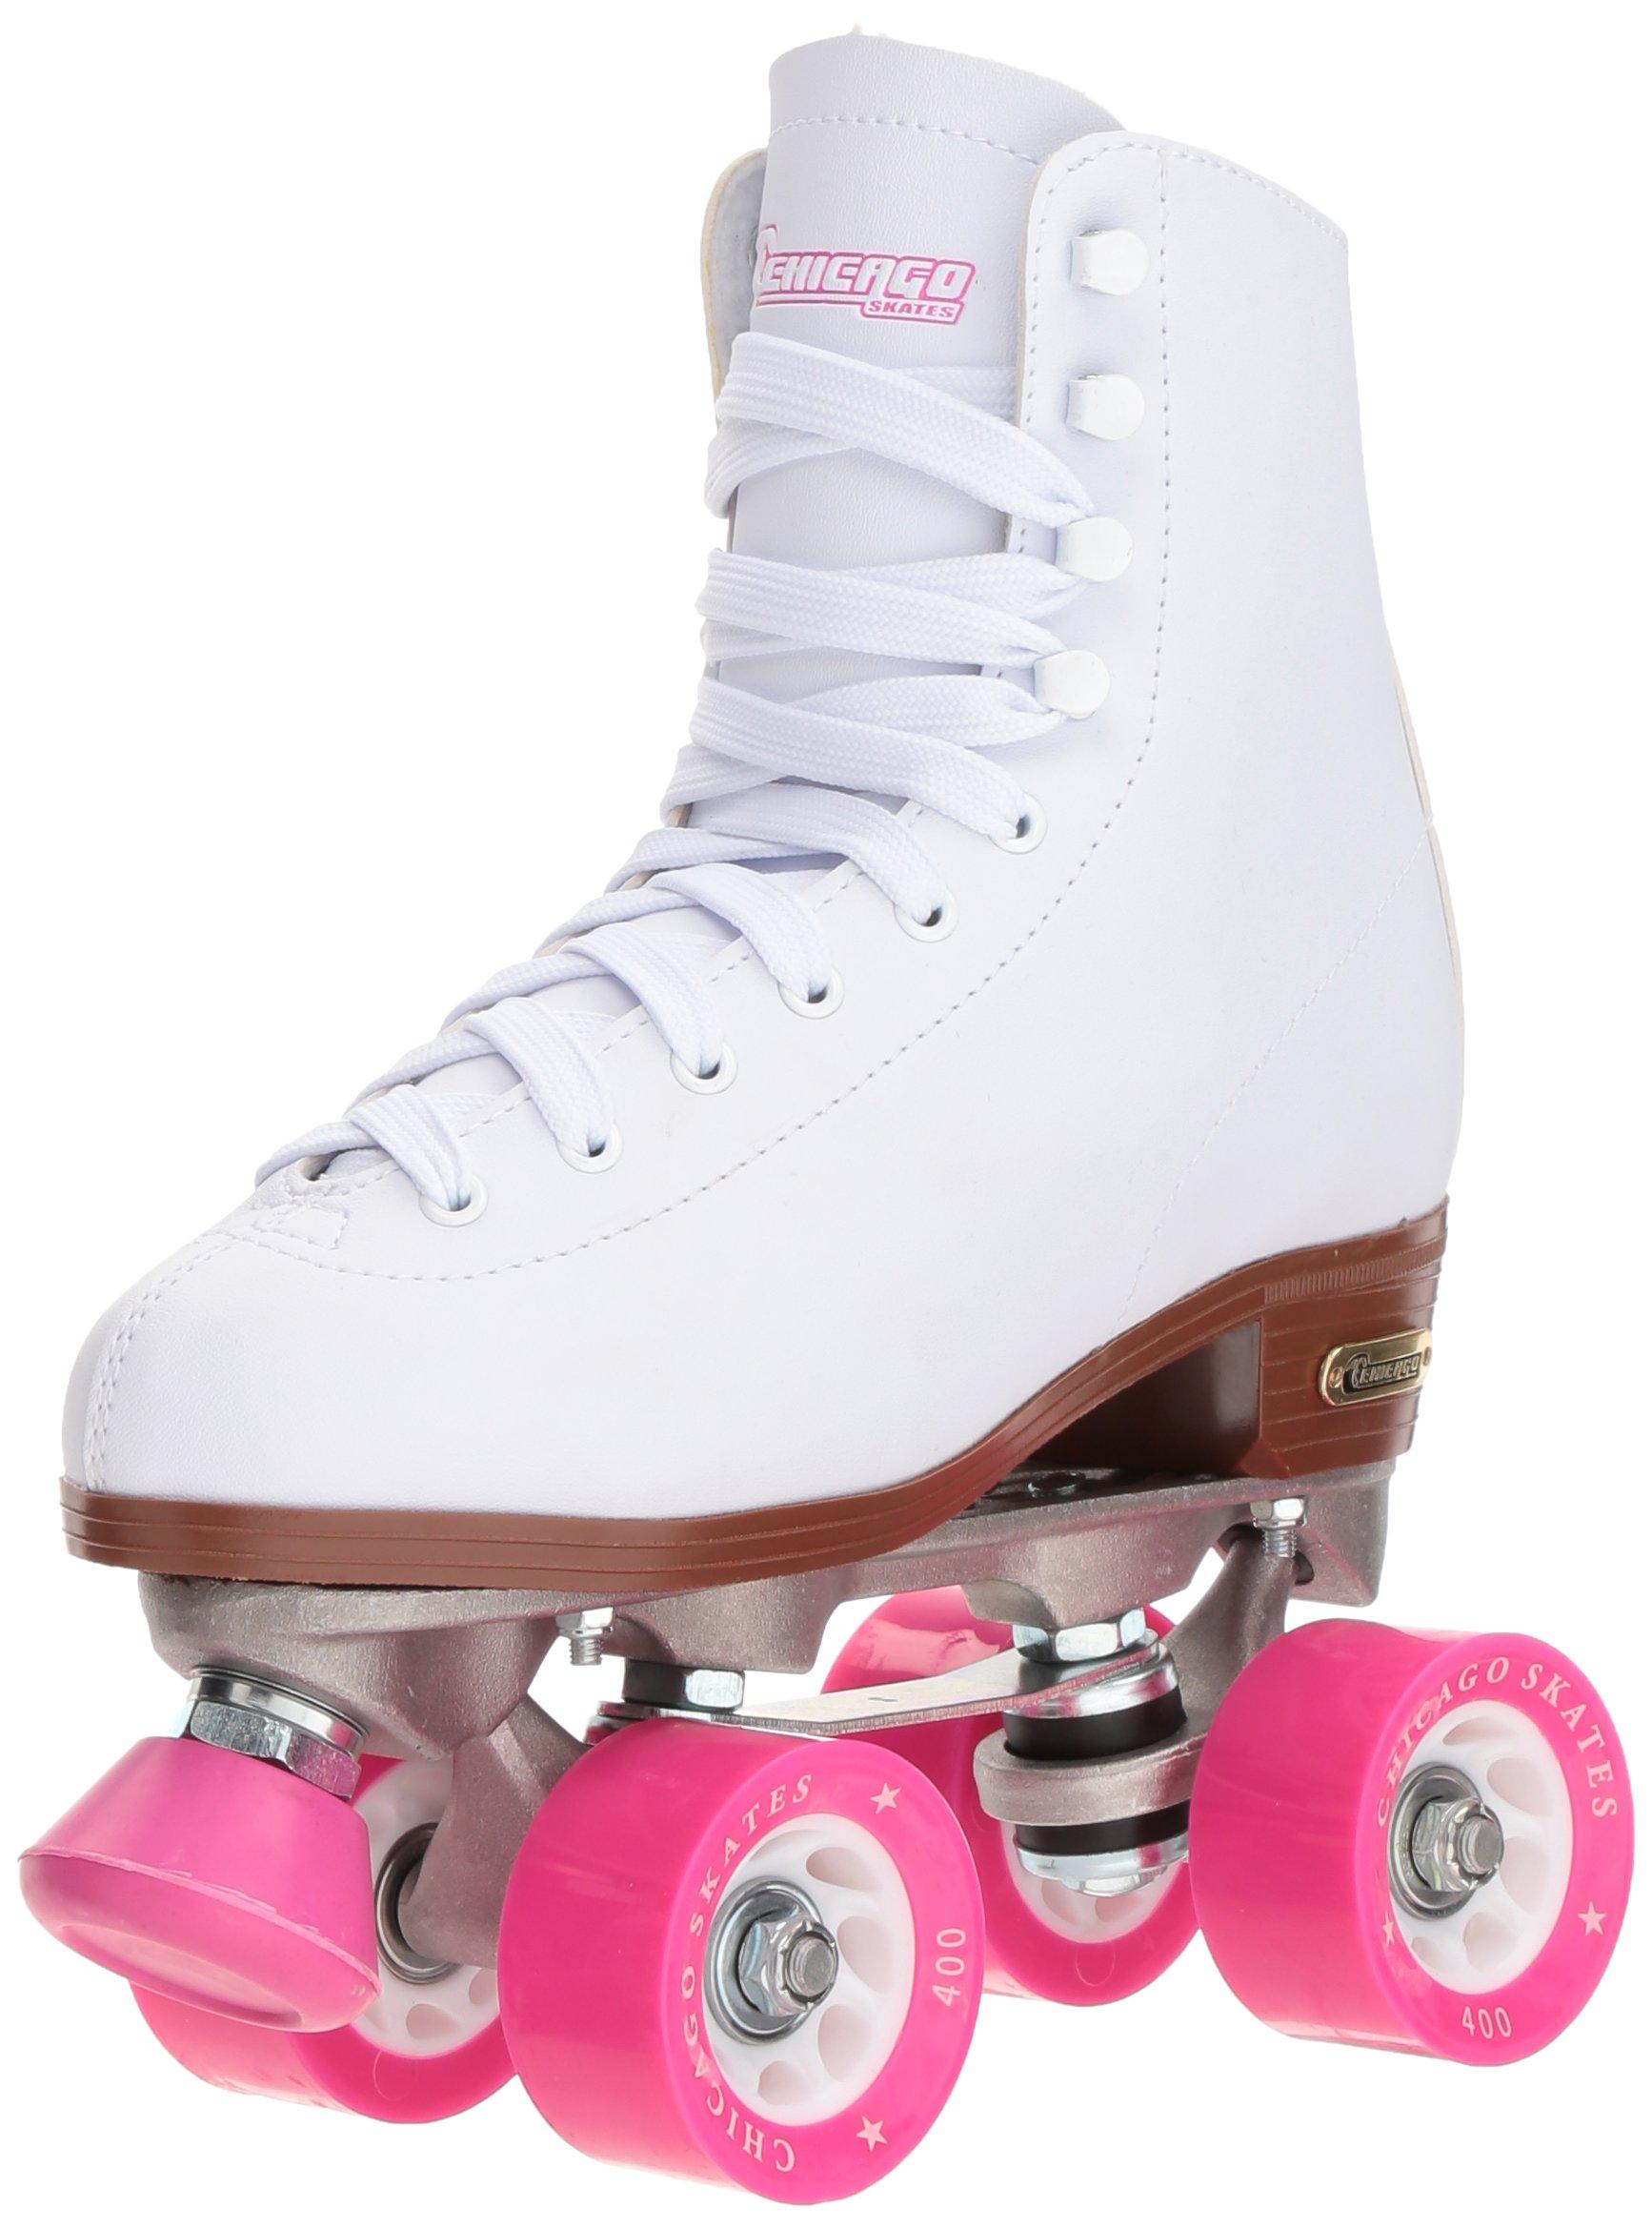 Chicago Womens Classic Roller Skates